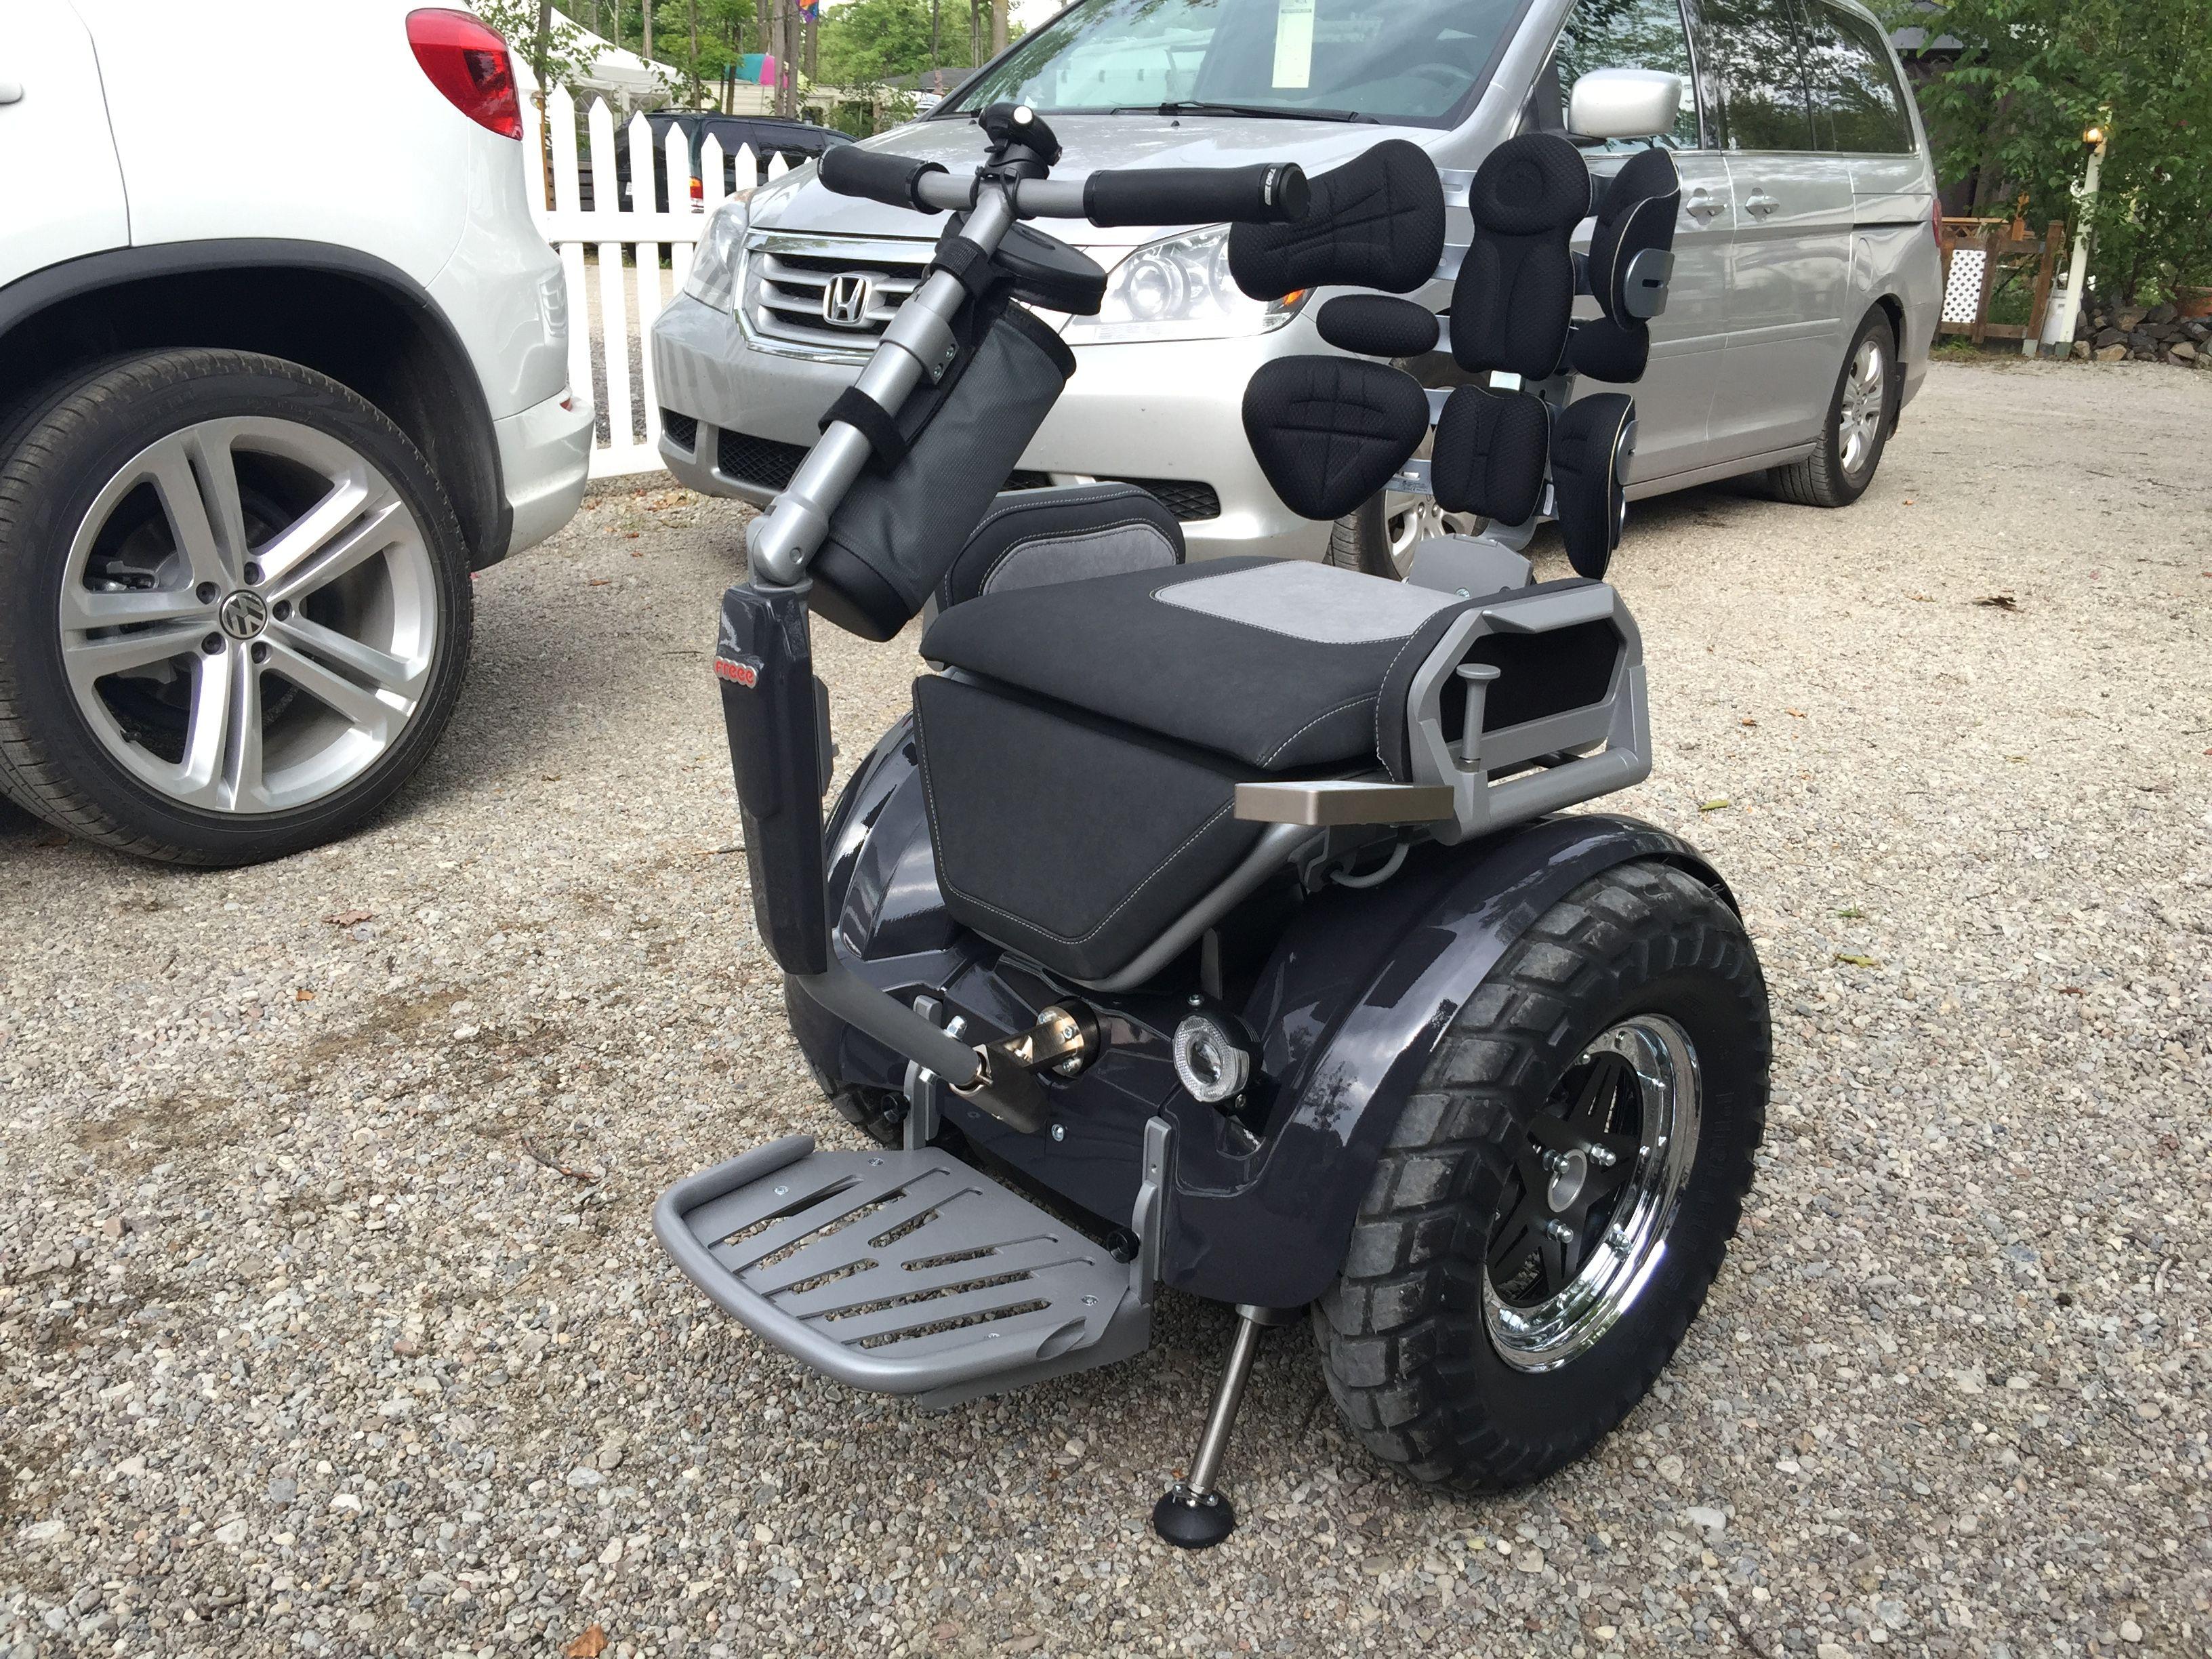 Pin By Sepim On Segway Wheelchair Wheelchair Sports Electric Wheelchair